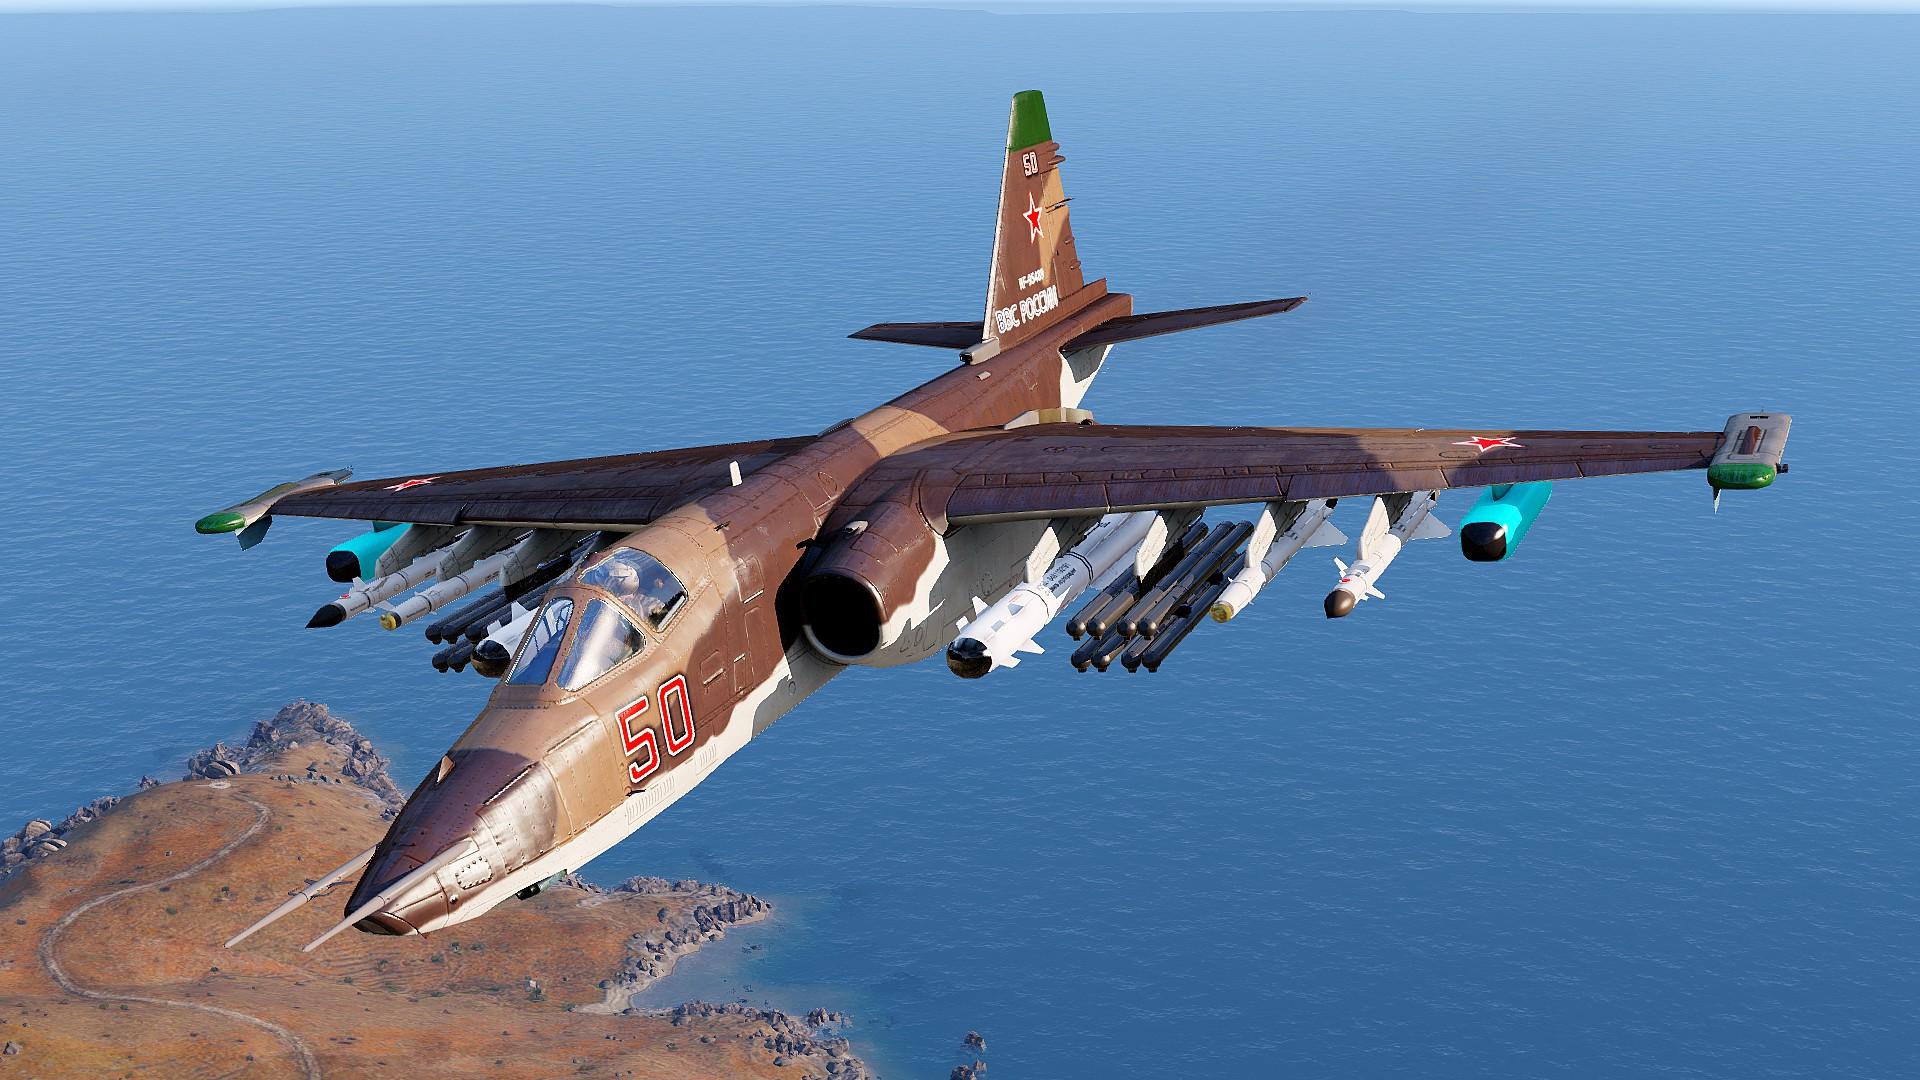 7772A9244C7DC5B526A344FAF2BF946D651A88FE